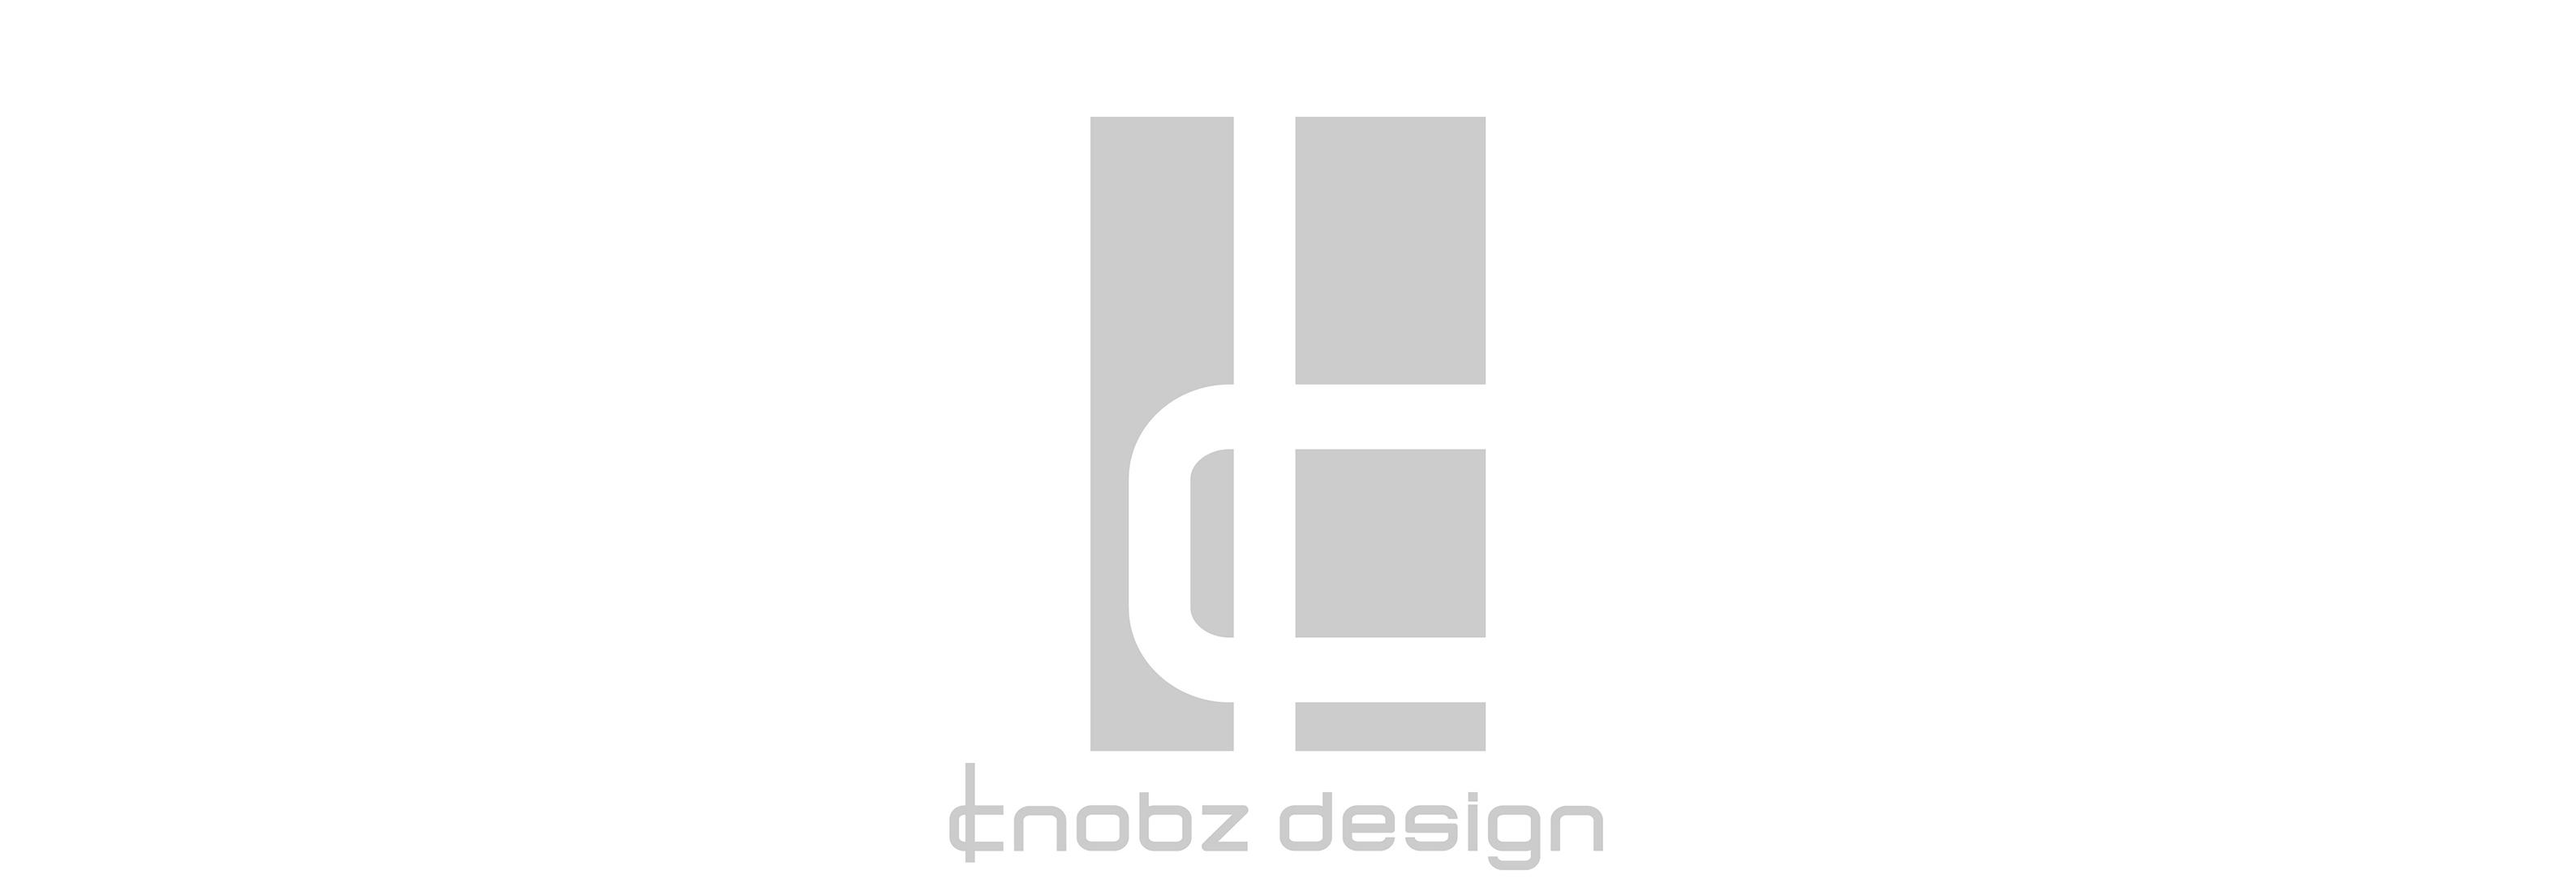 knobz design